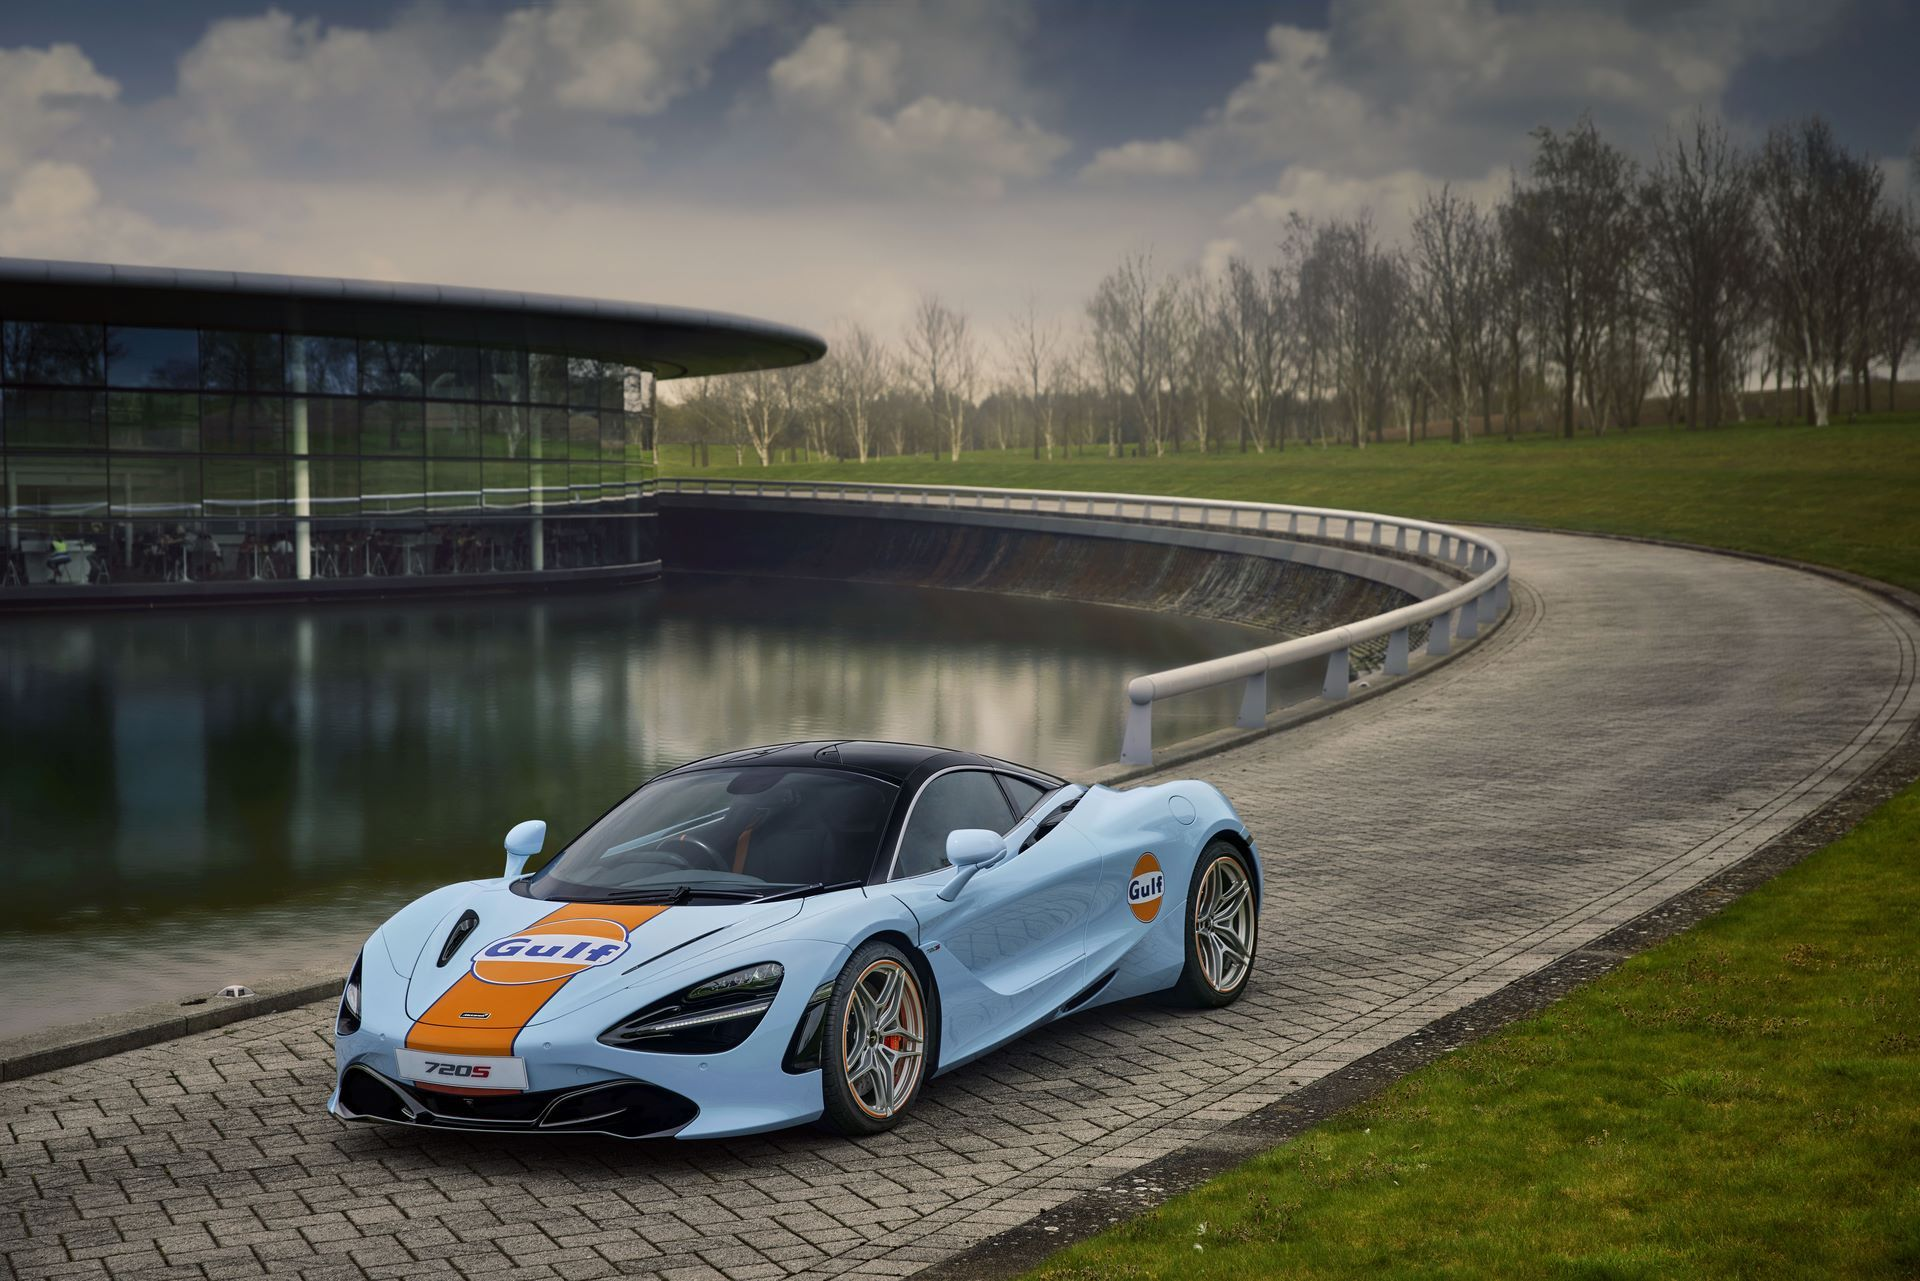 McLaren-720S-with-Gulf-livery-6